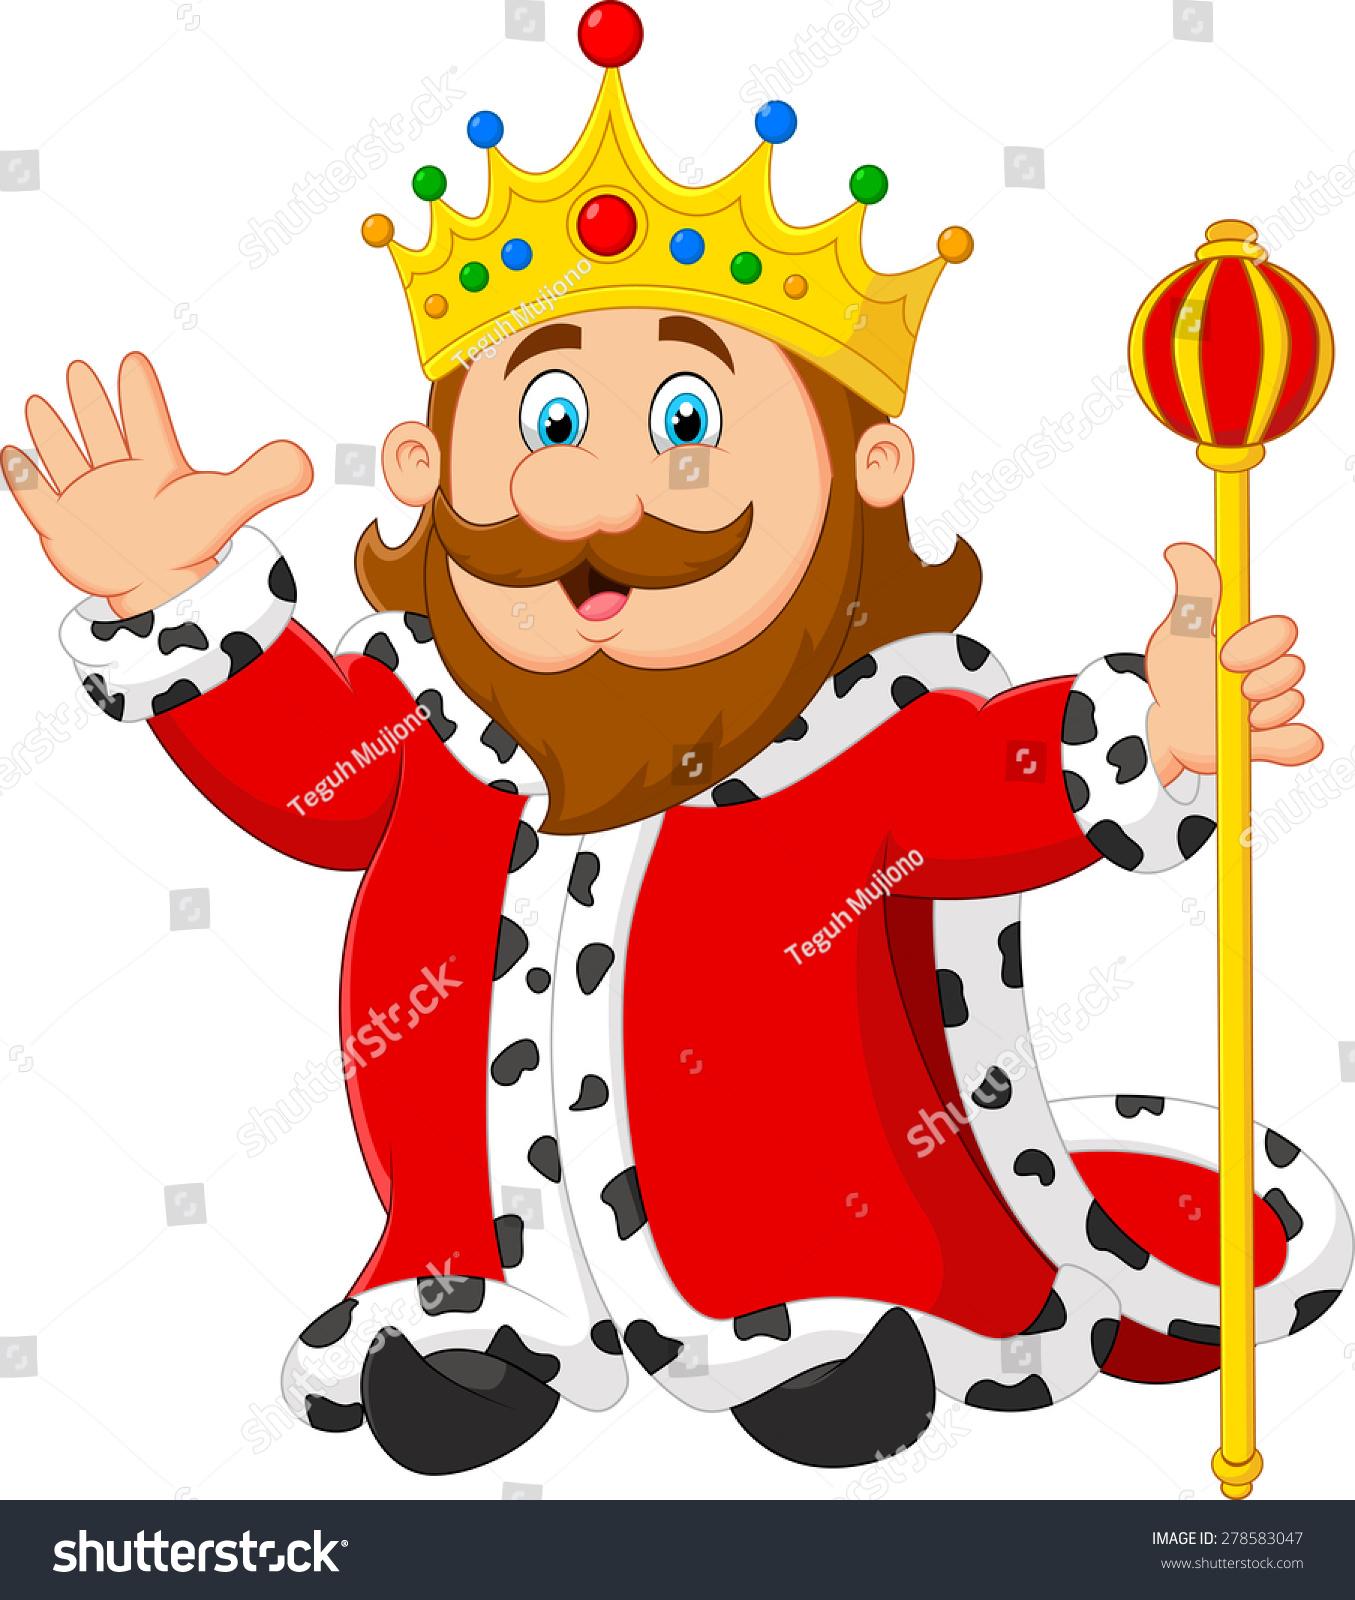 Cartoon King Holding Golden Scepter Stock Vector 278583047 ...